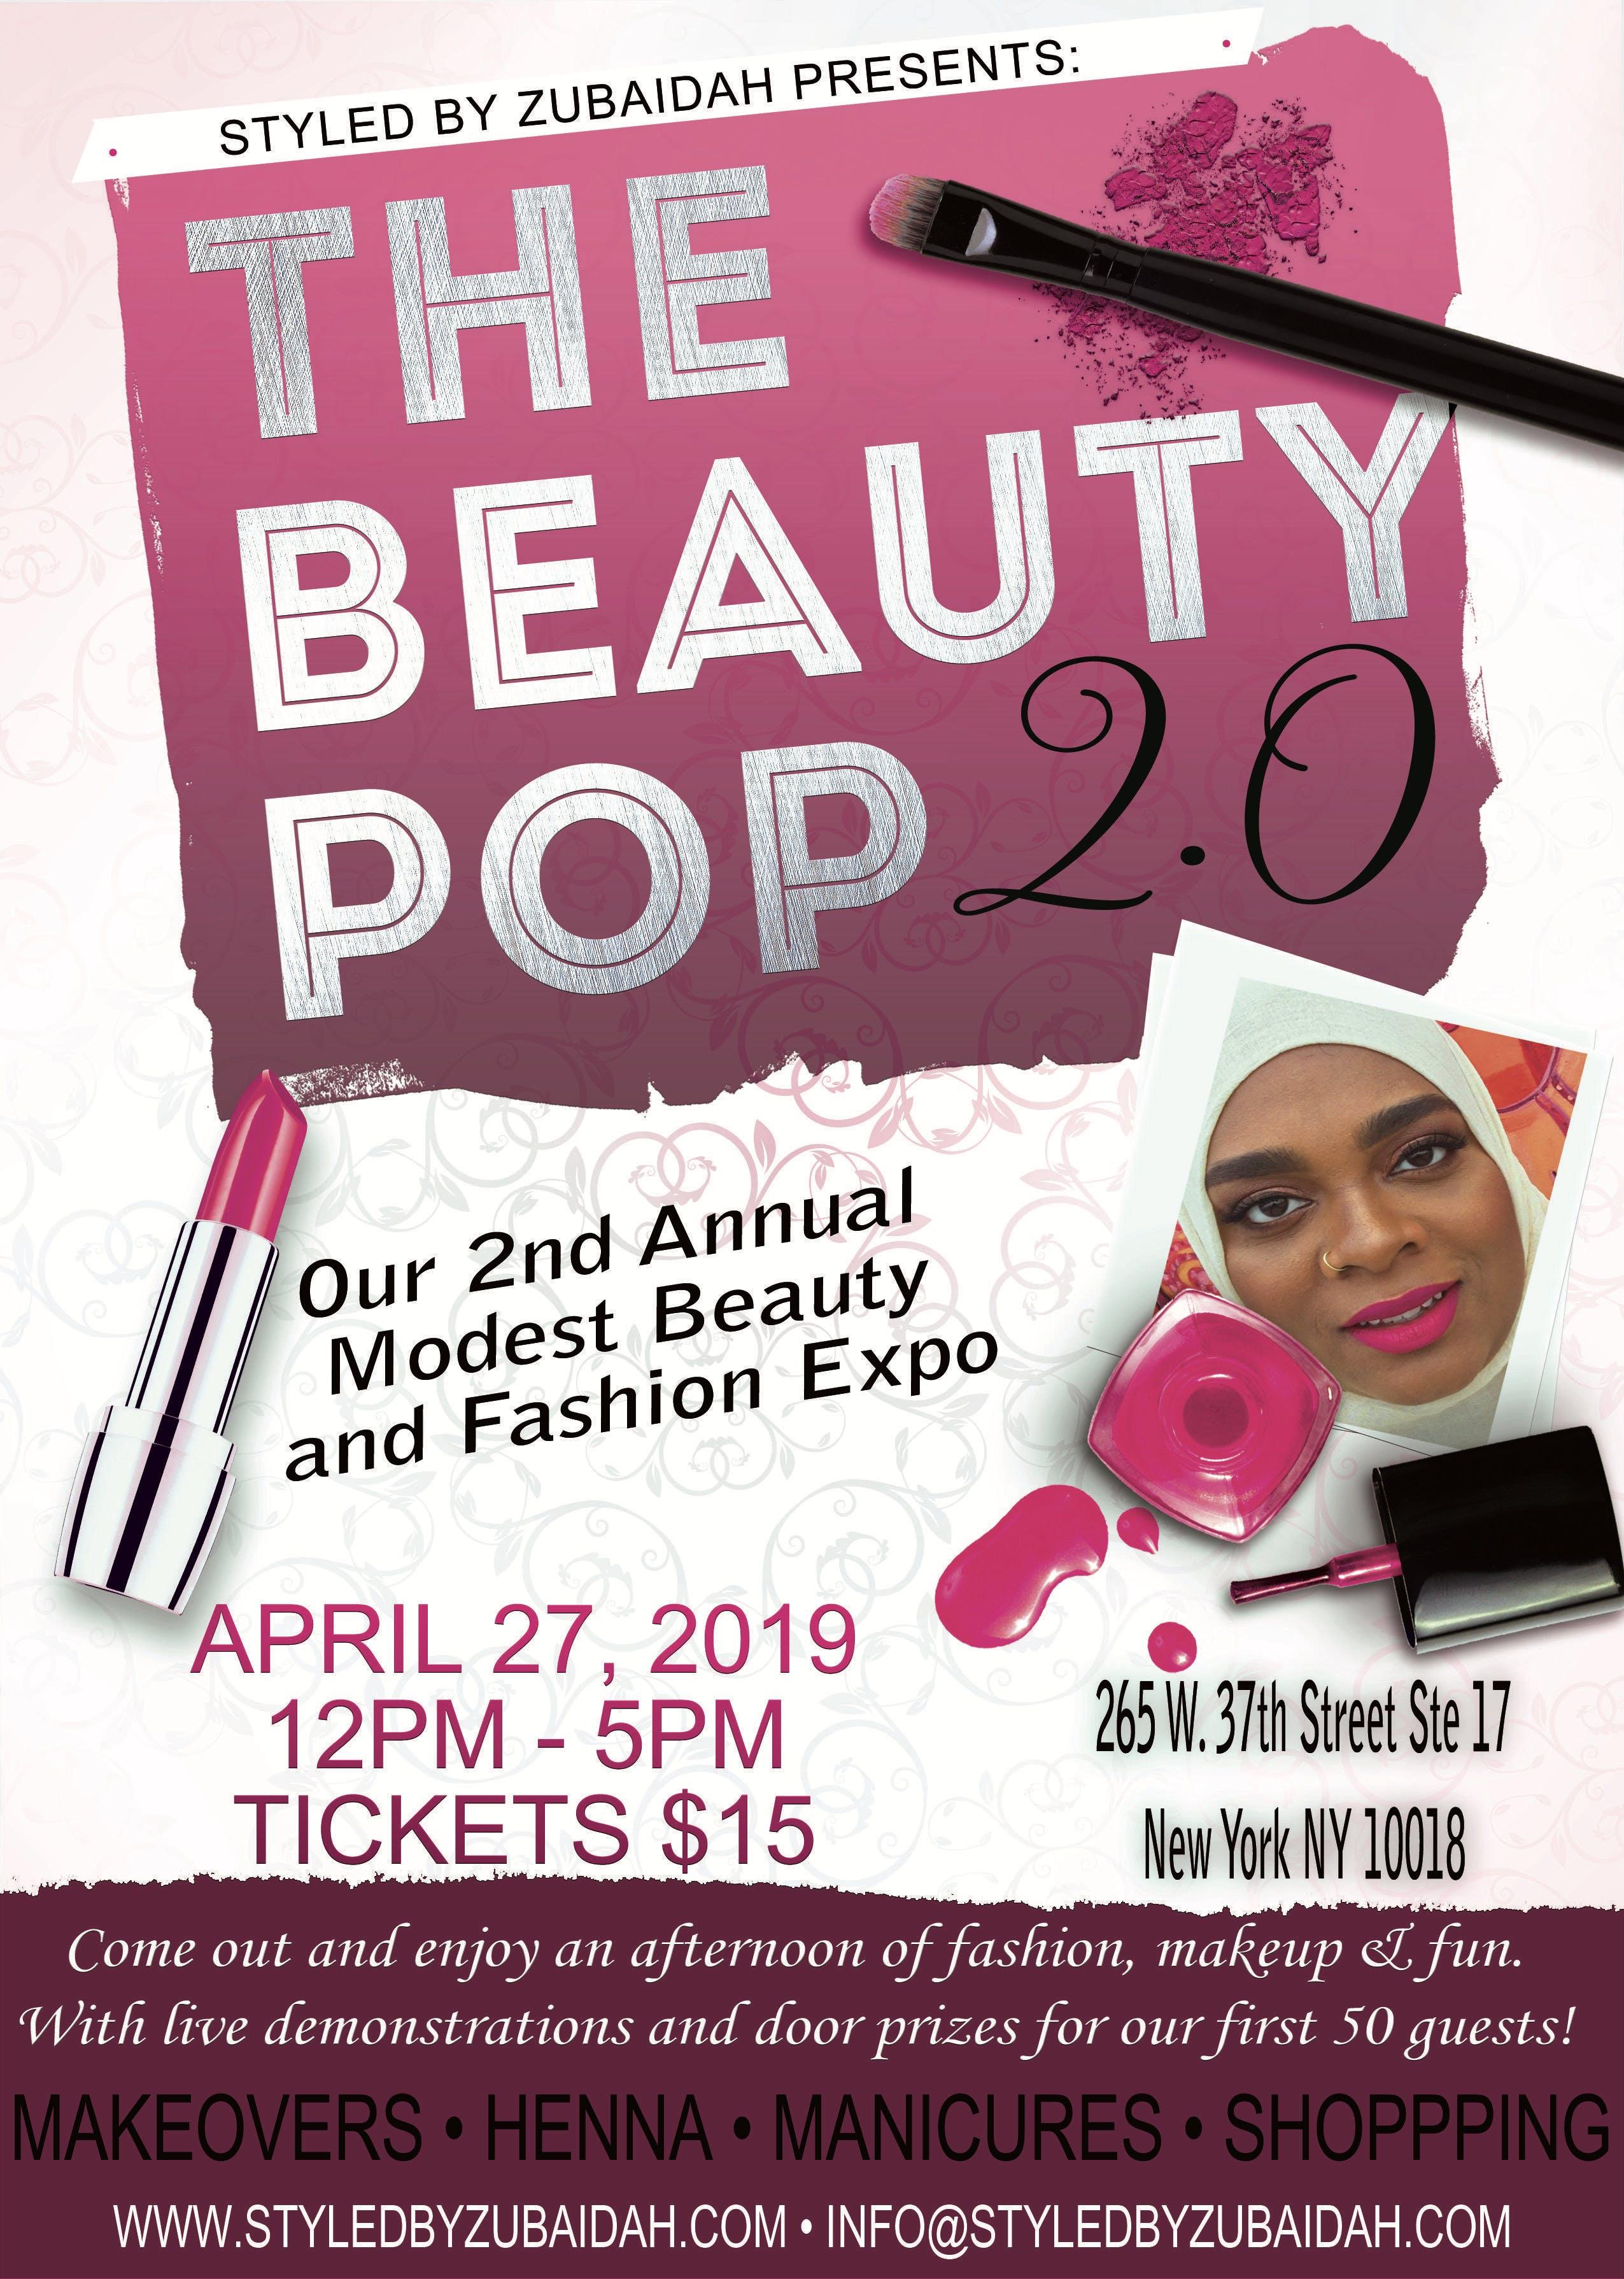 The Beauty Pop 2.0